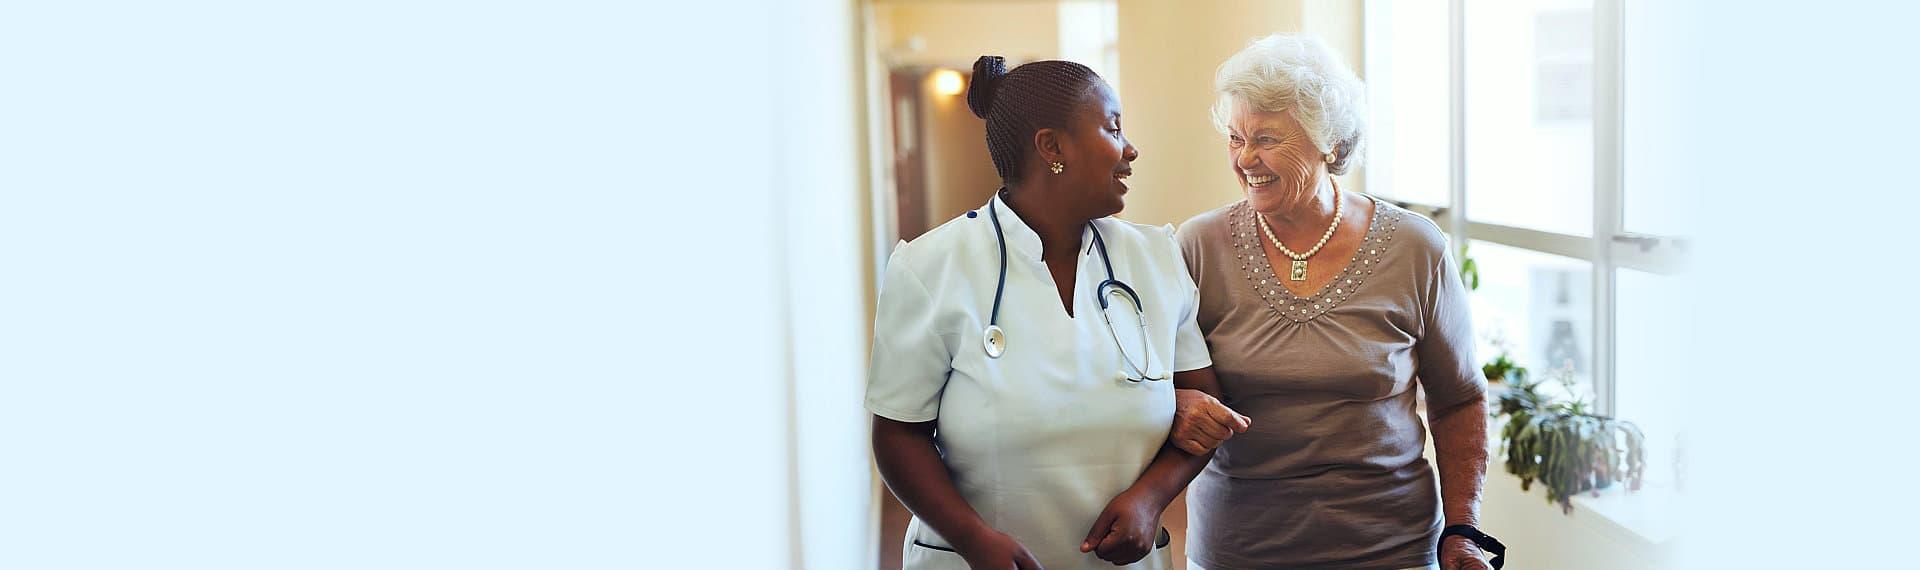 nurse and senior woman laughing